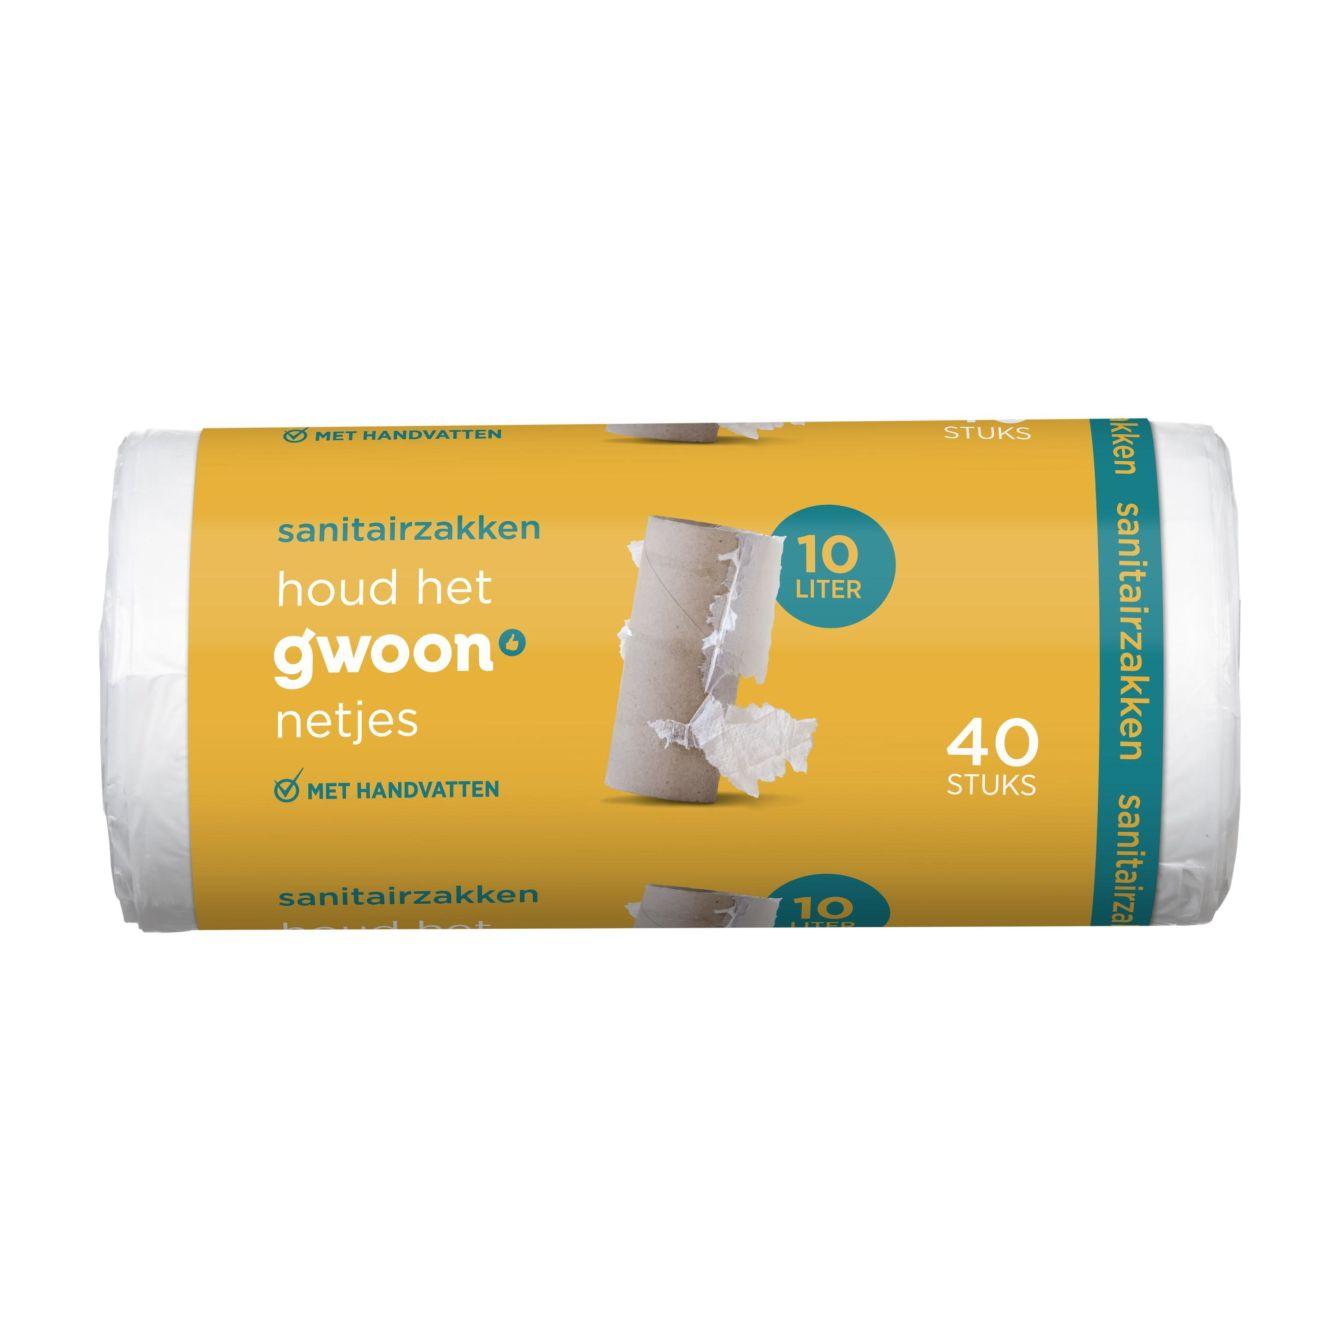 G'woon Sanitairzakken 10 Liter